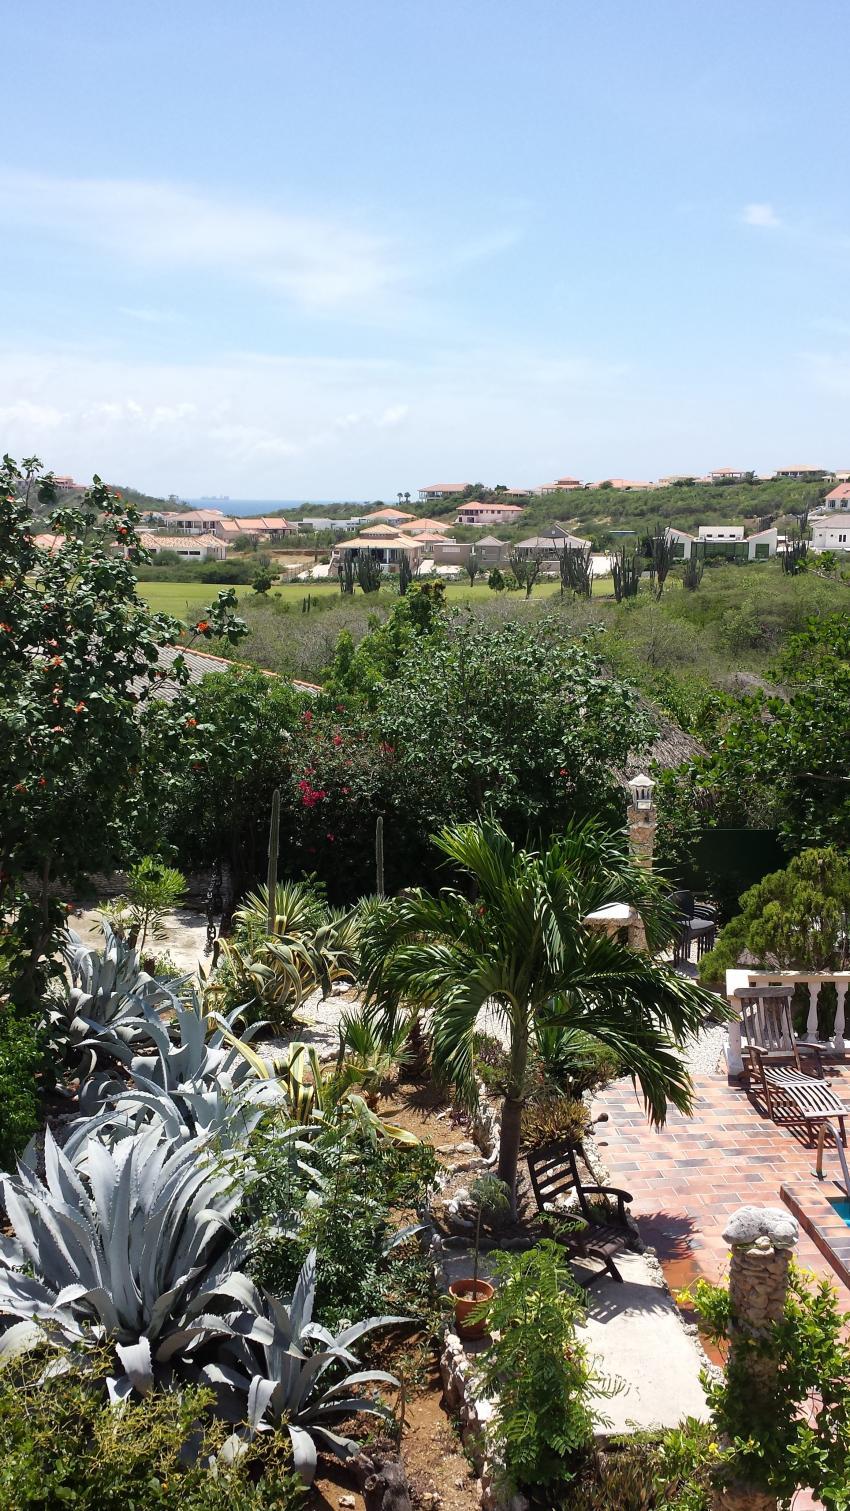 Garten 2, Diving Curacao (Kashimiri Apartments), Niederländische Antillen, Curaçao